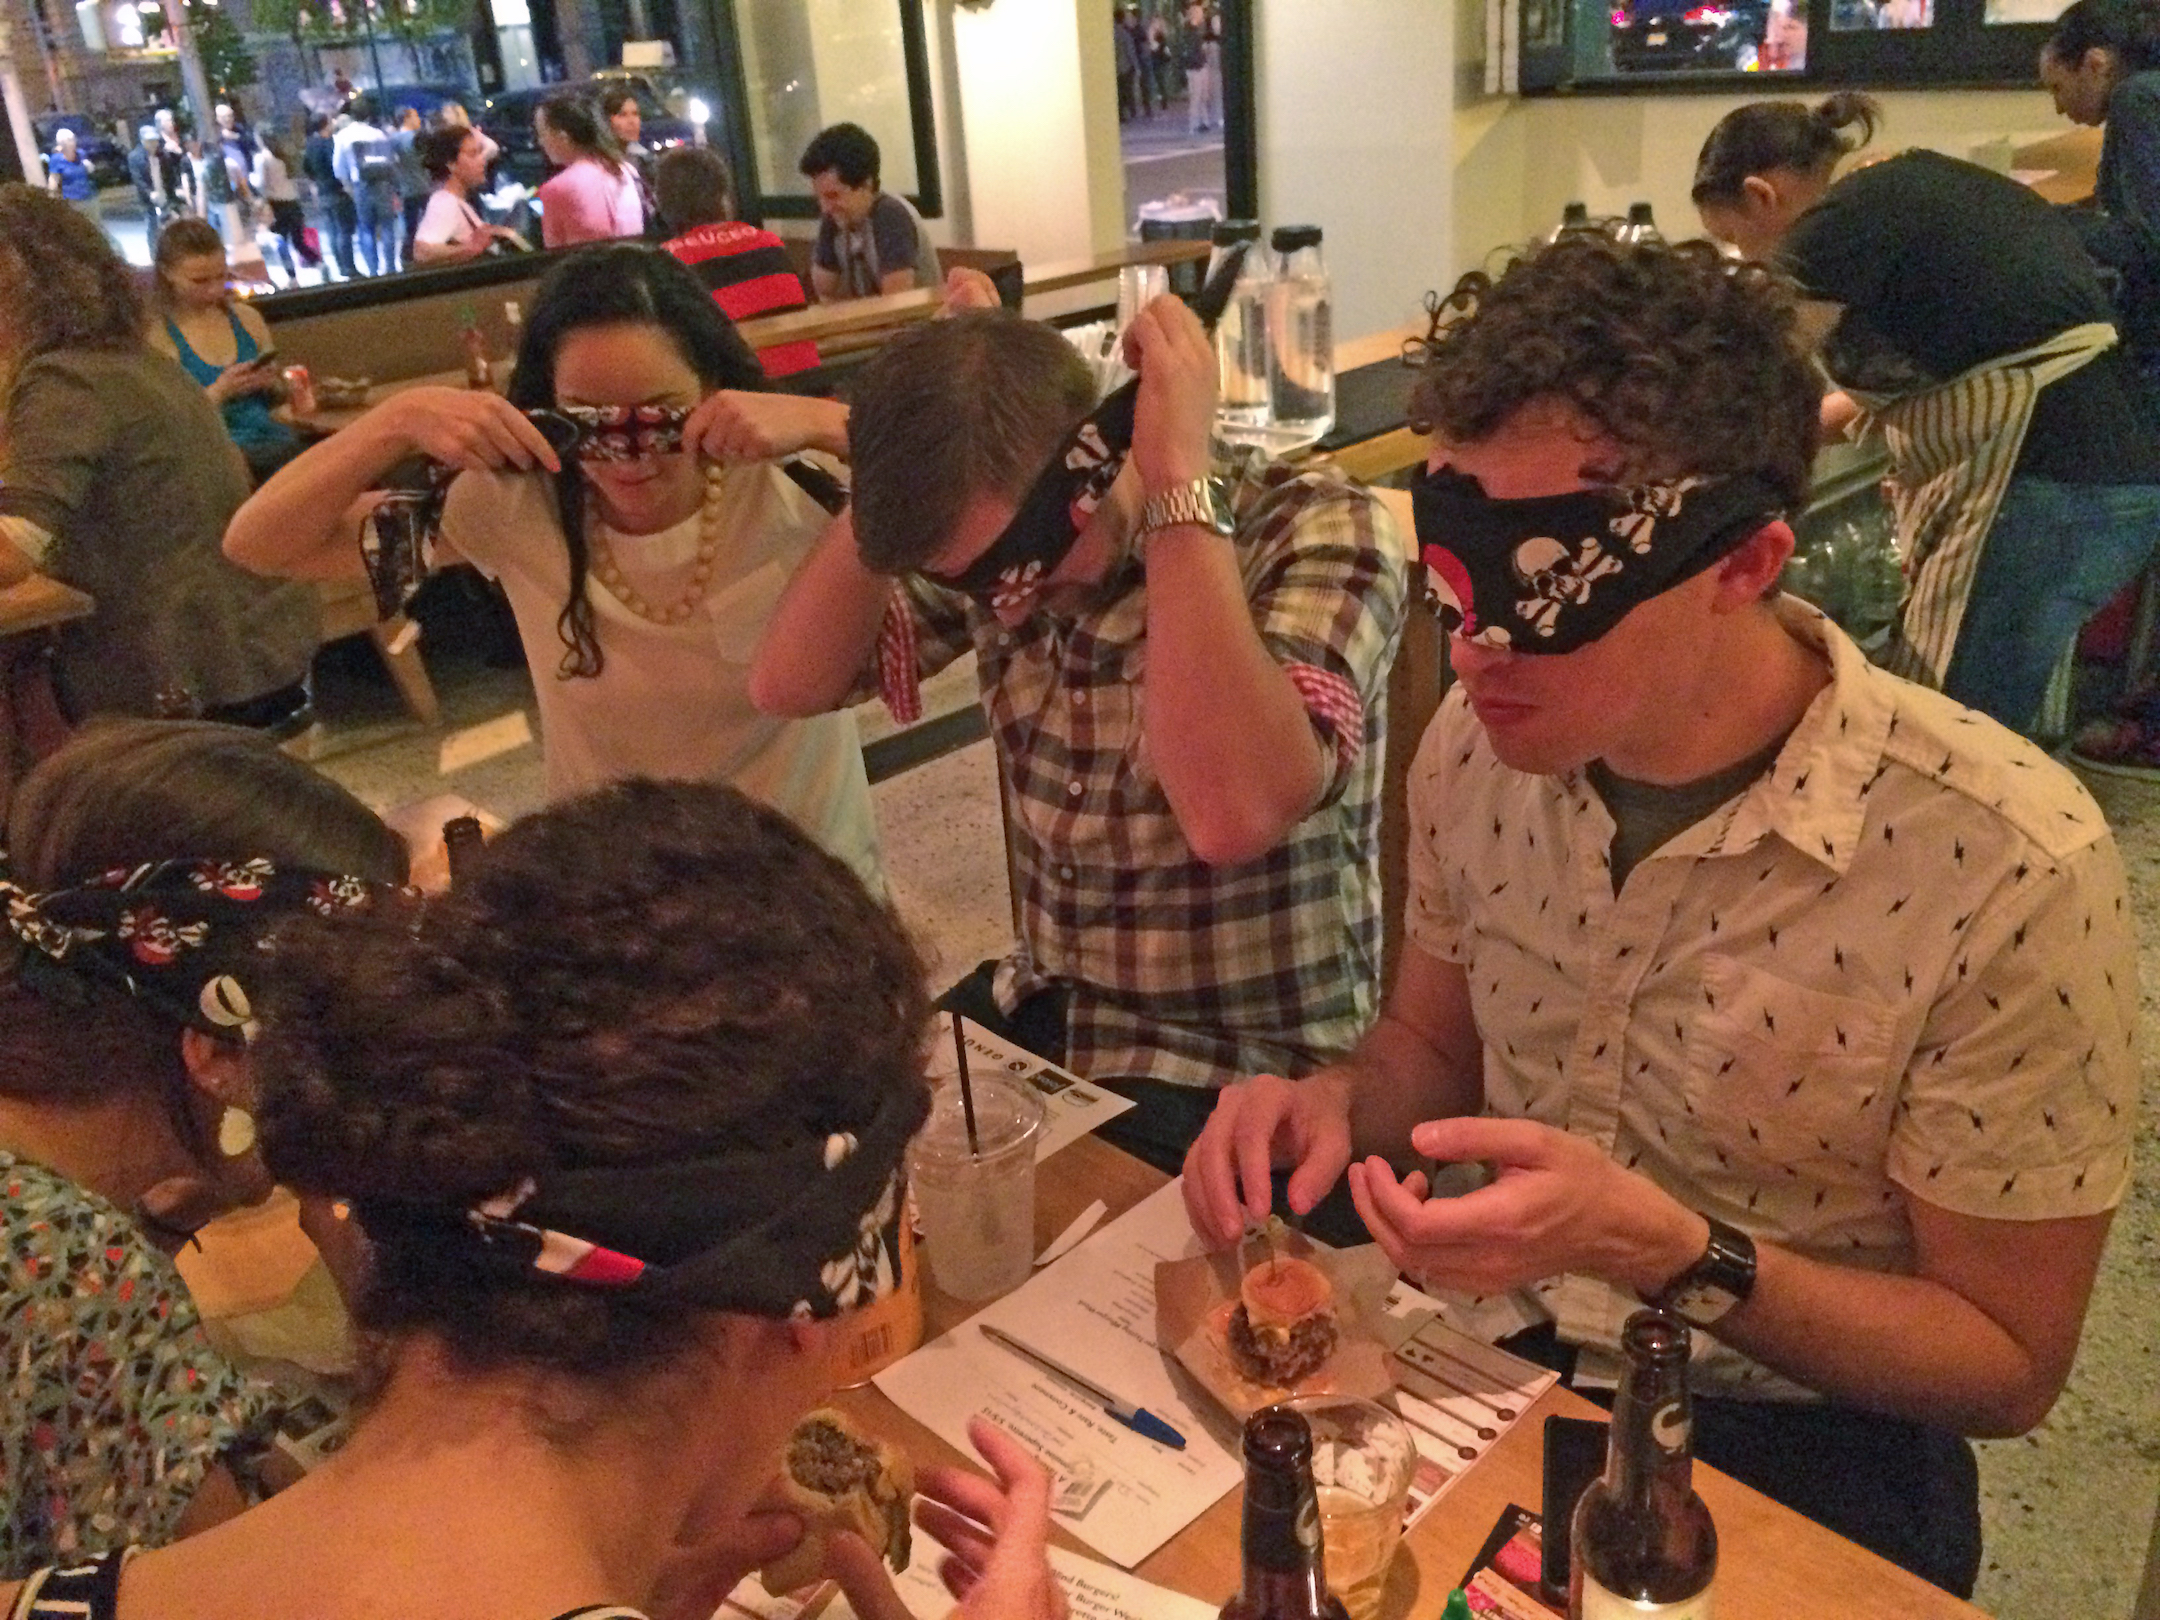 Schweid-and-Sons-Blind-Burger-Tasting-Genuine-Superette-2015-NY-Burger-Week-2084